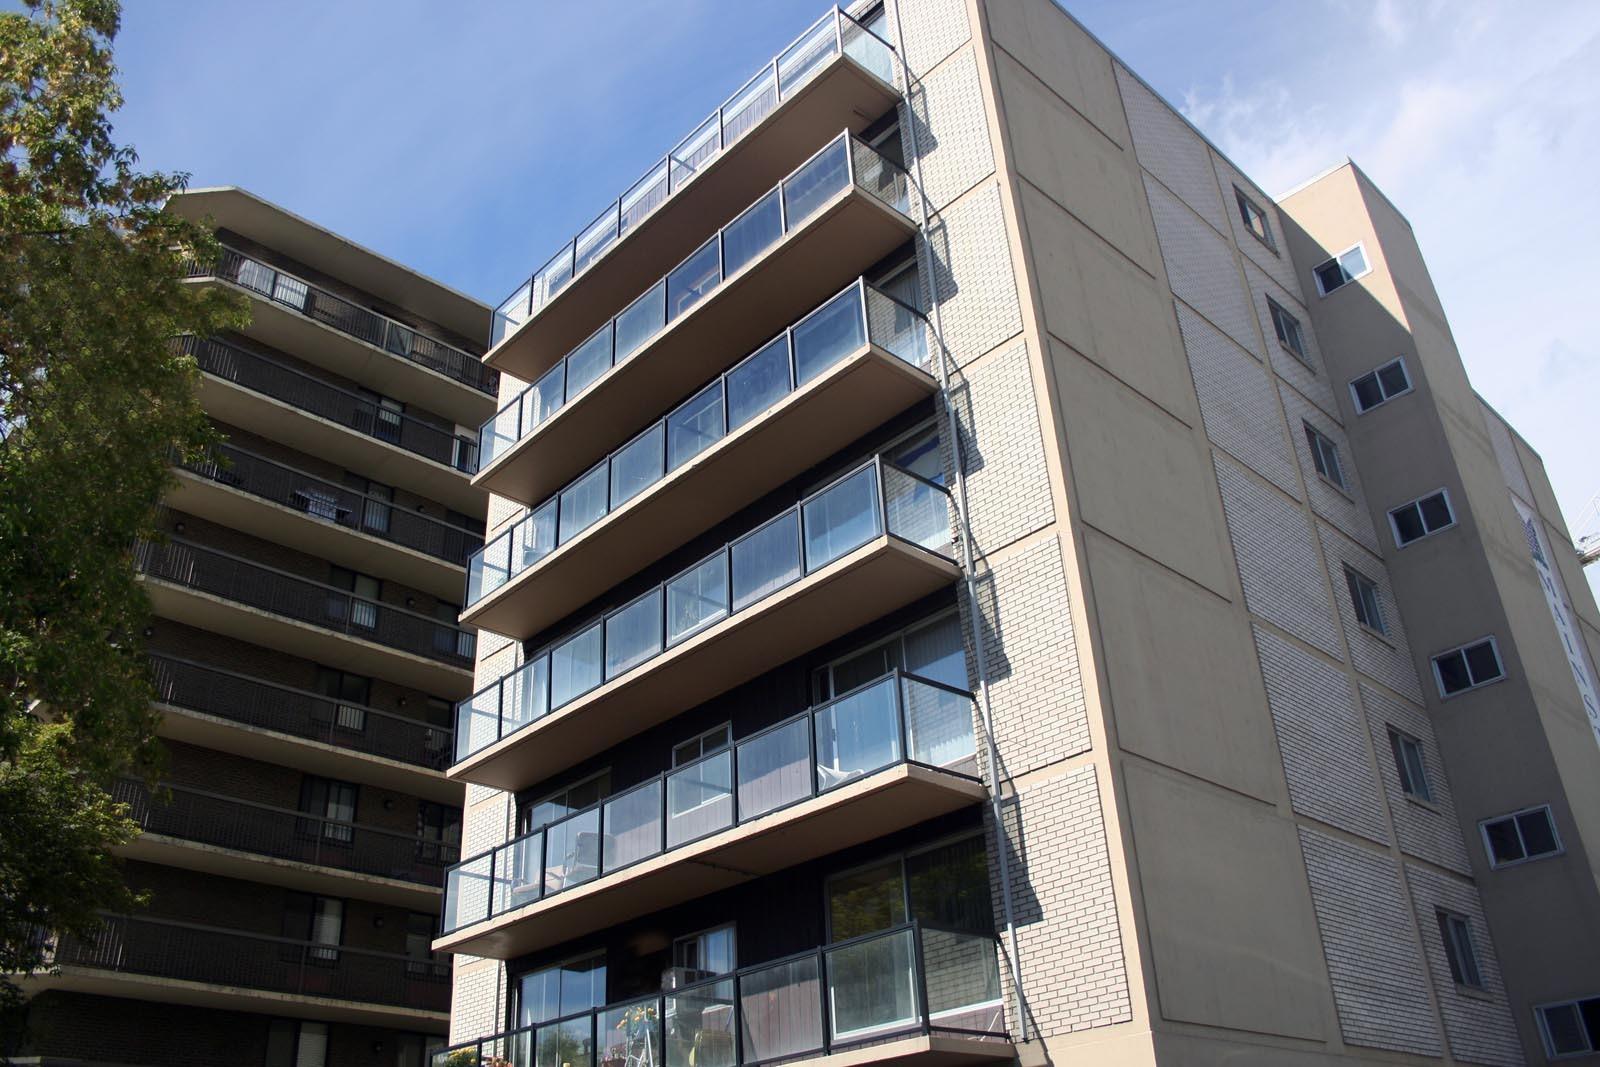 211 14 Avenue SW, Calgary, AB - $925